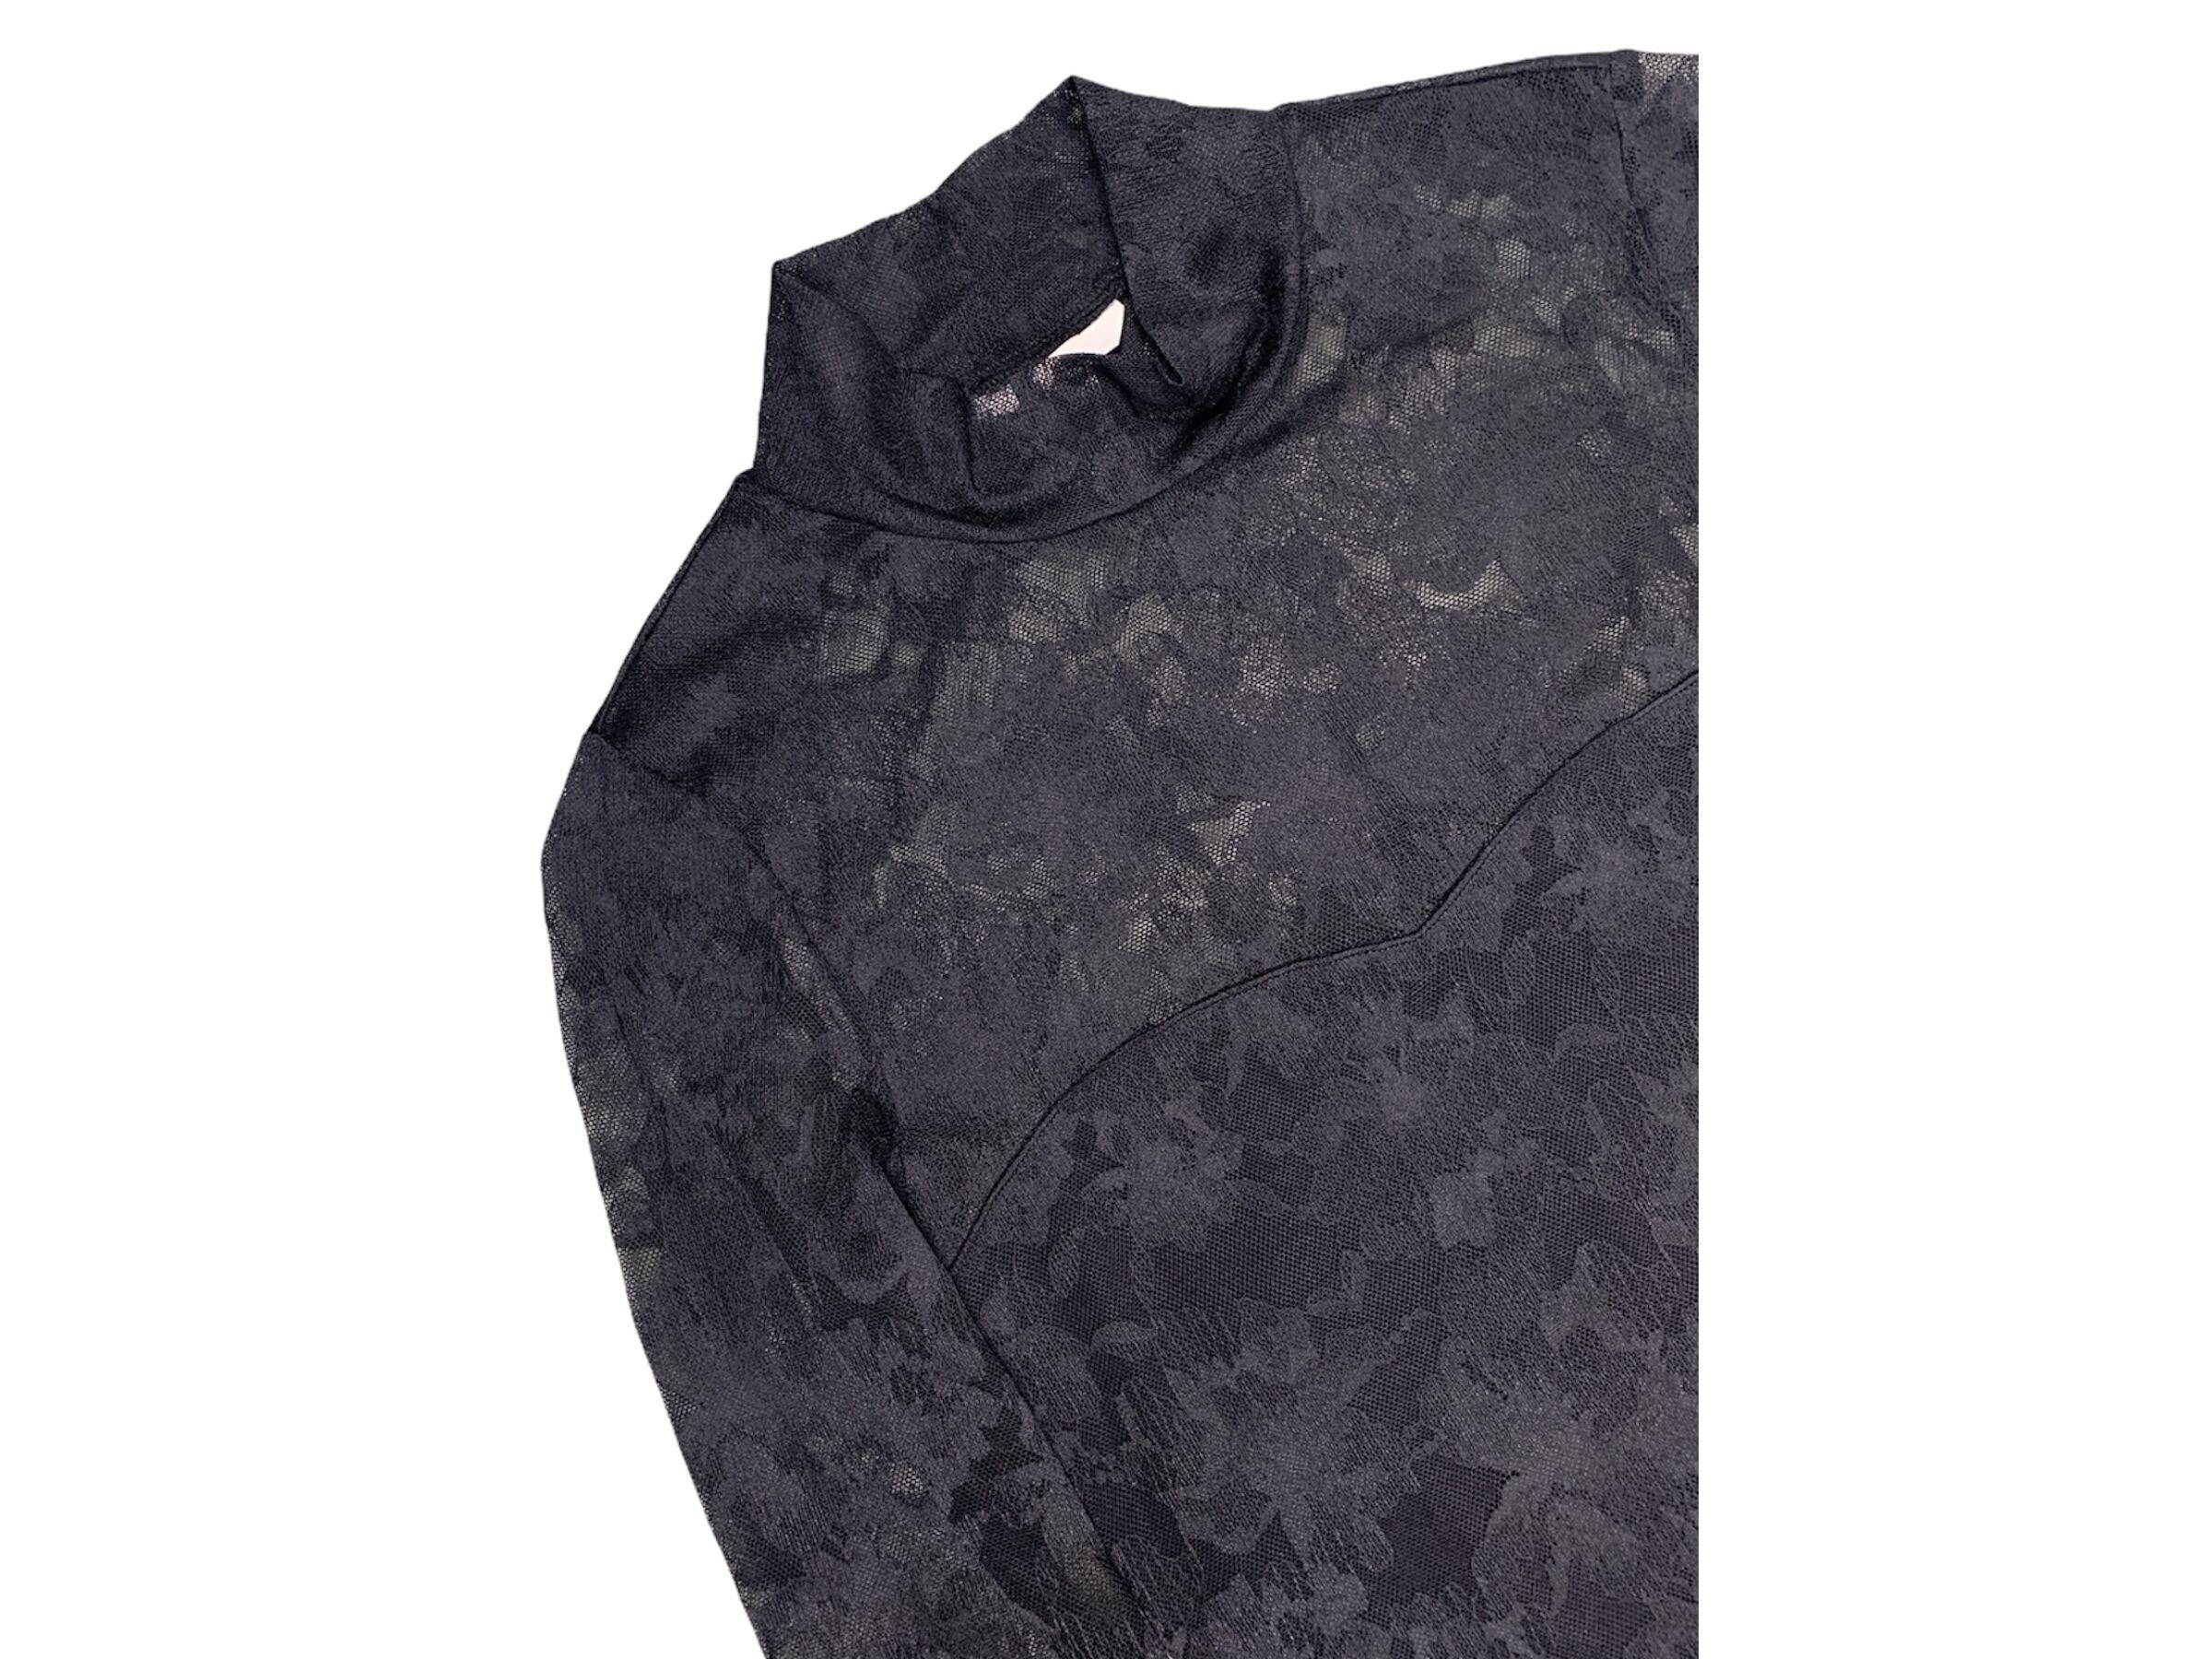 H&M csipke body (XS)